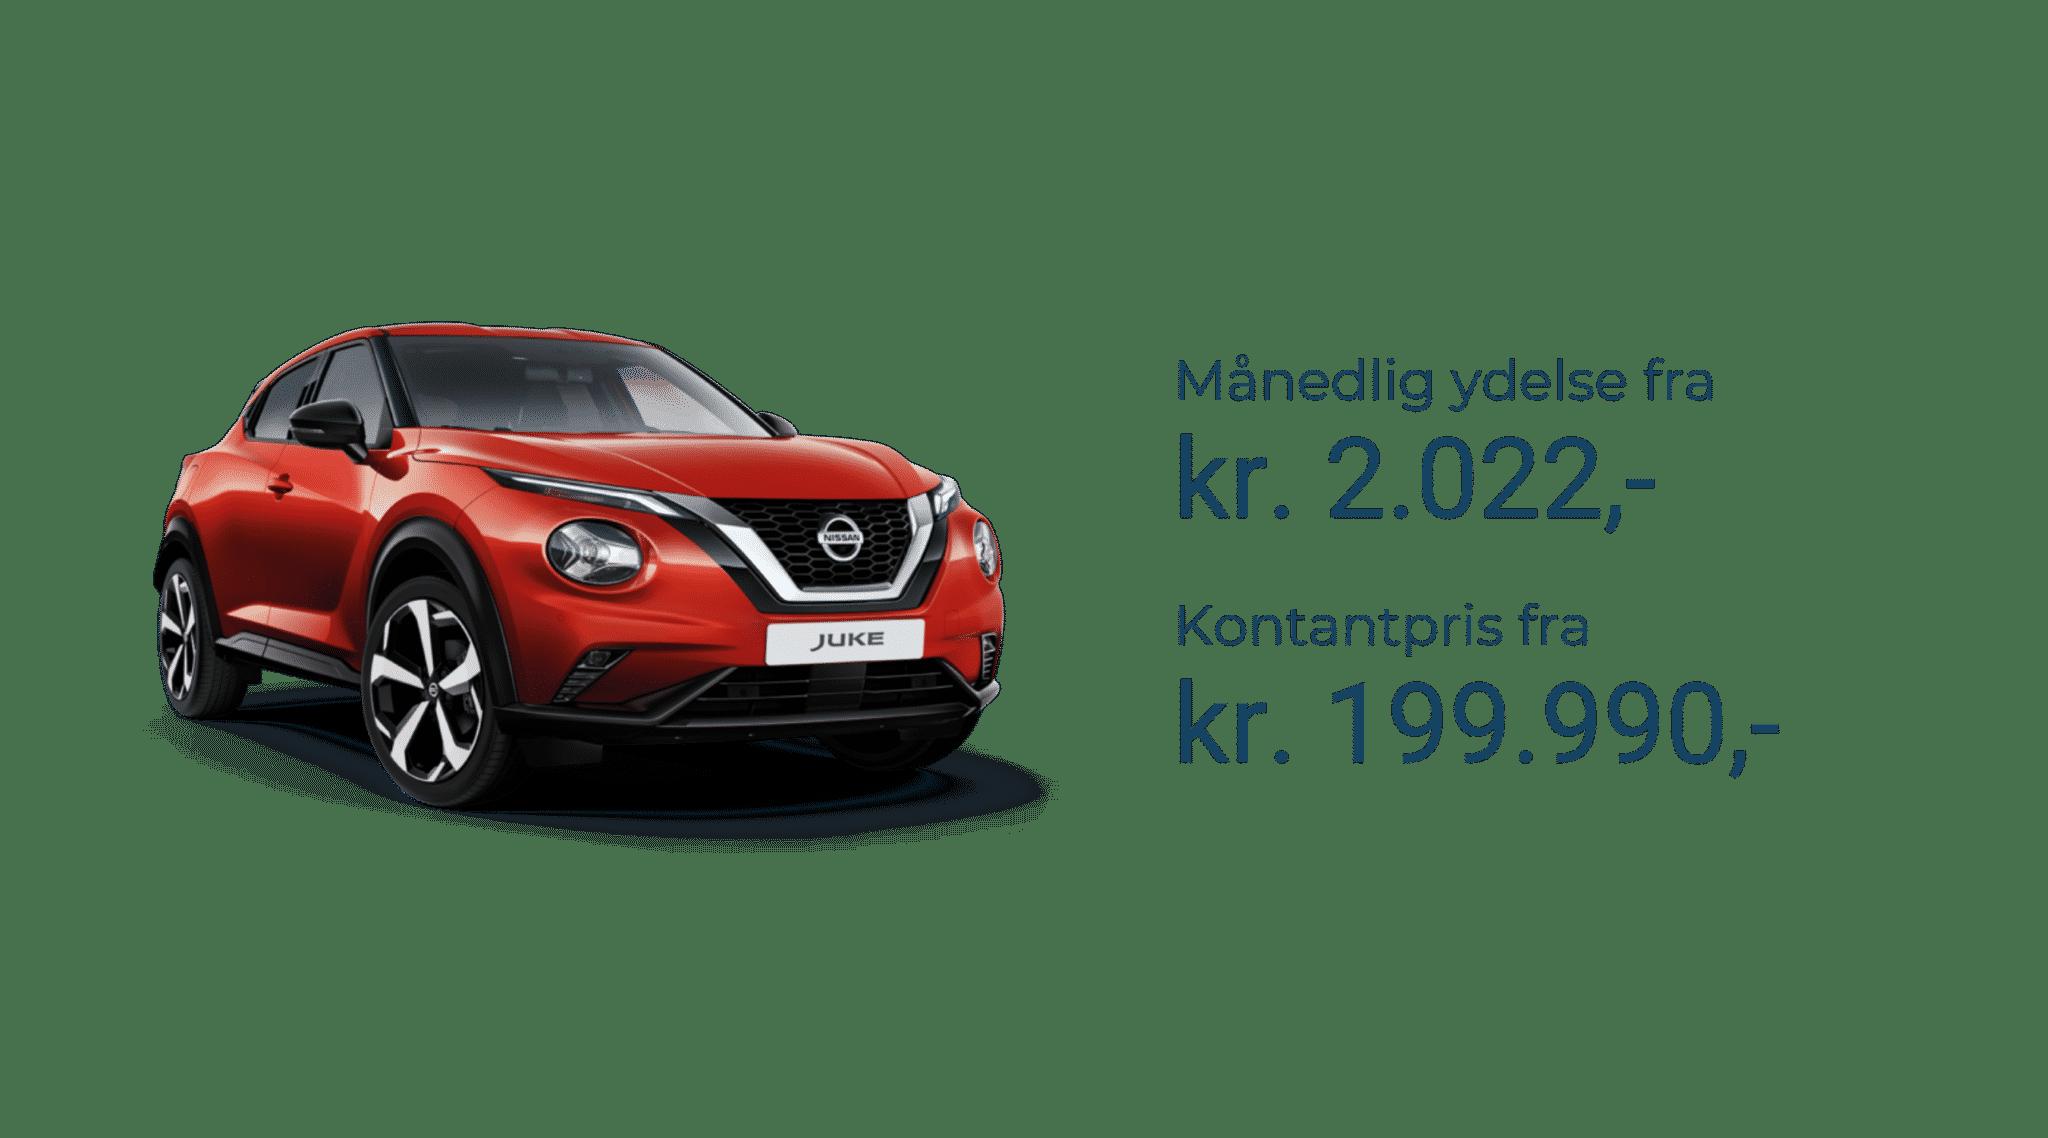 Nissan juke priser